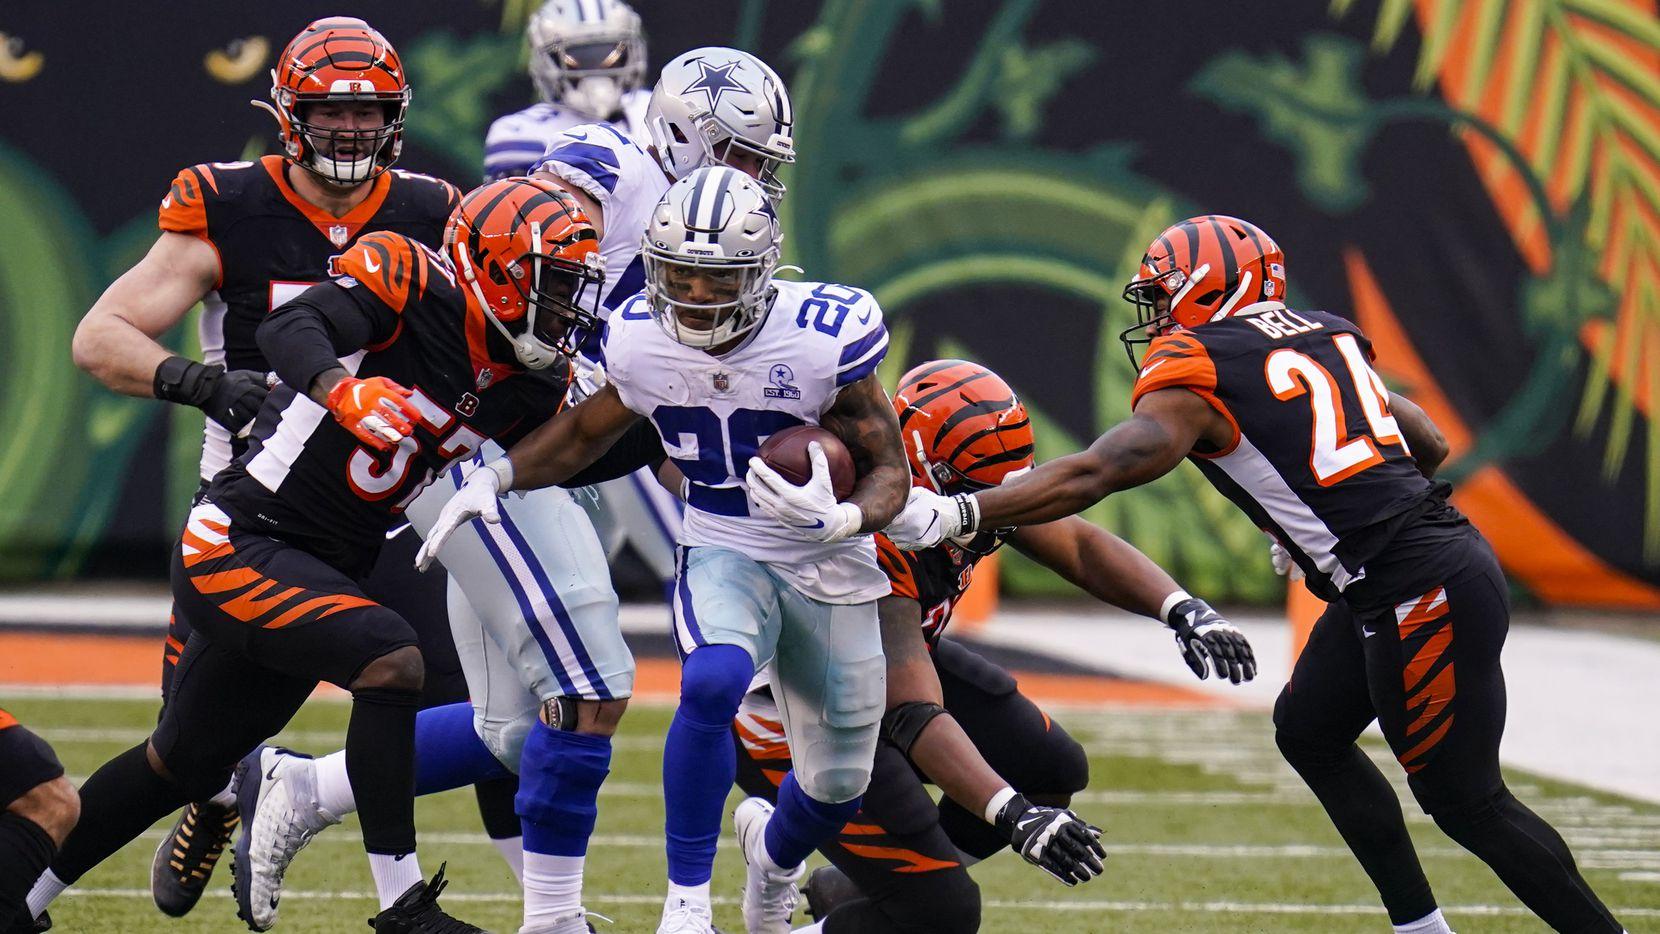 Dallas Cowboys running back Tony Pollard (20) runs against the Cincinnati Bengals in the second half of an NFL football game in Cincinnati, Sunday, Dec. 13, 2020. (AP Photo/Bryan Woolston)